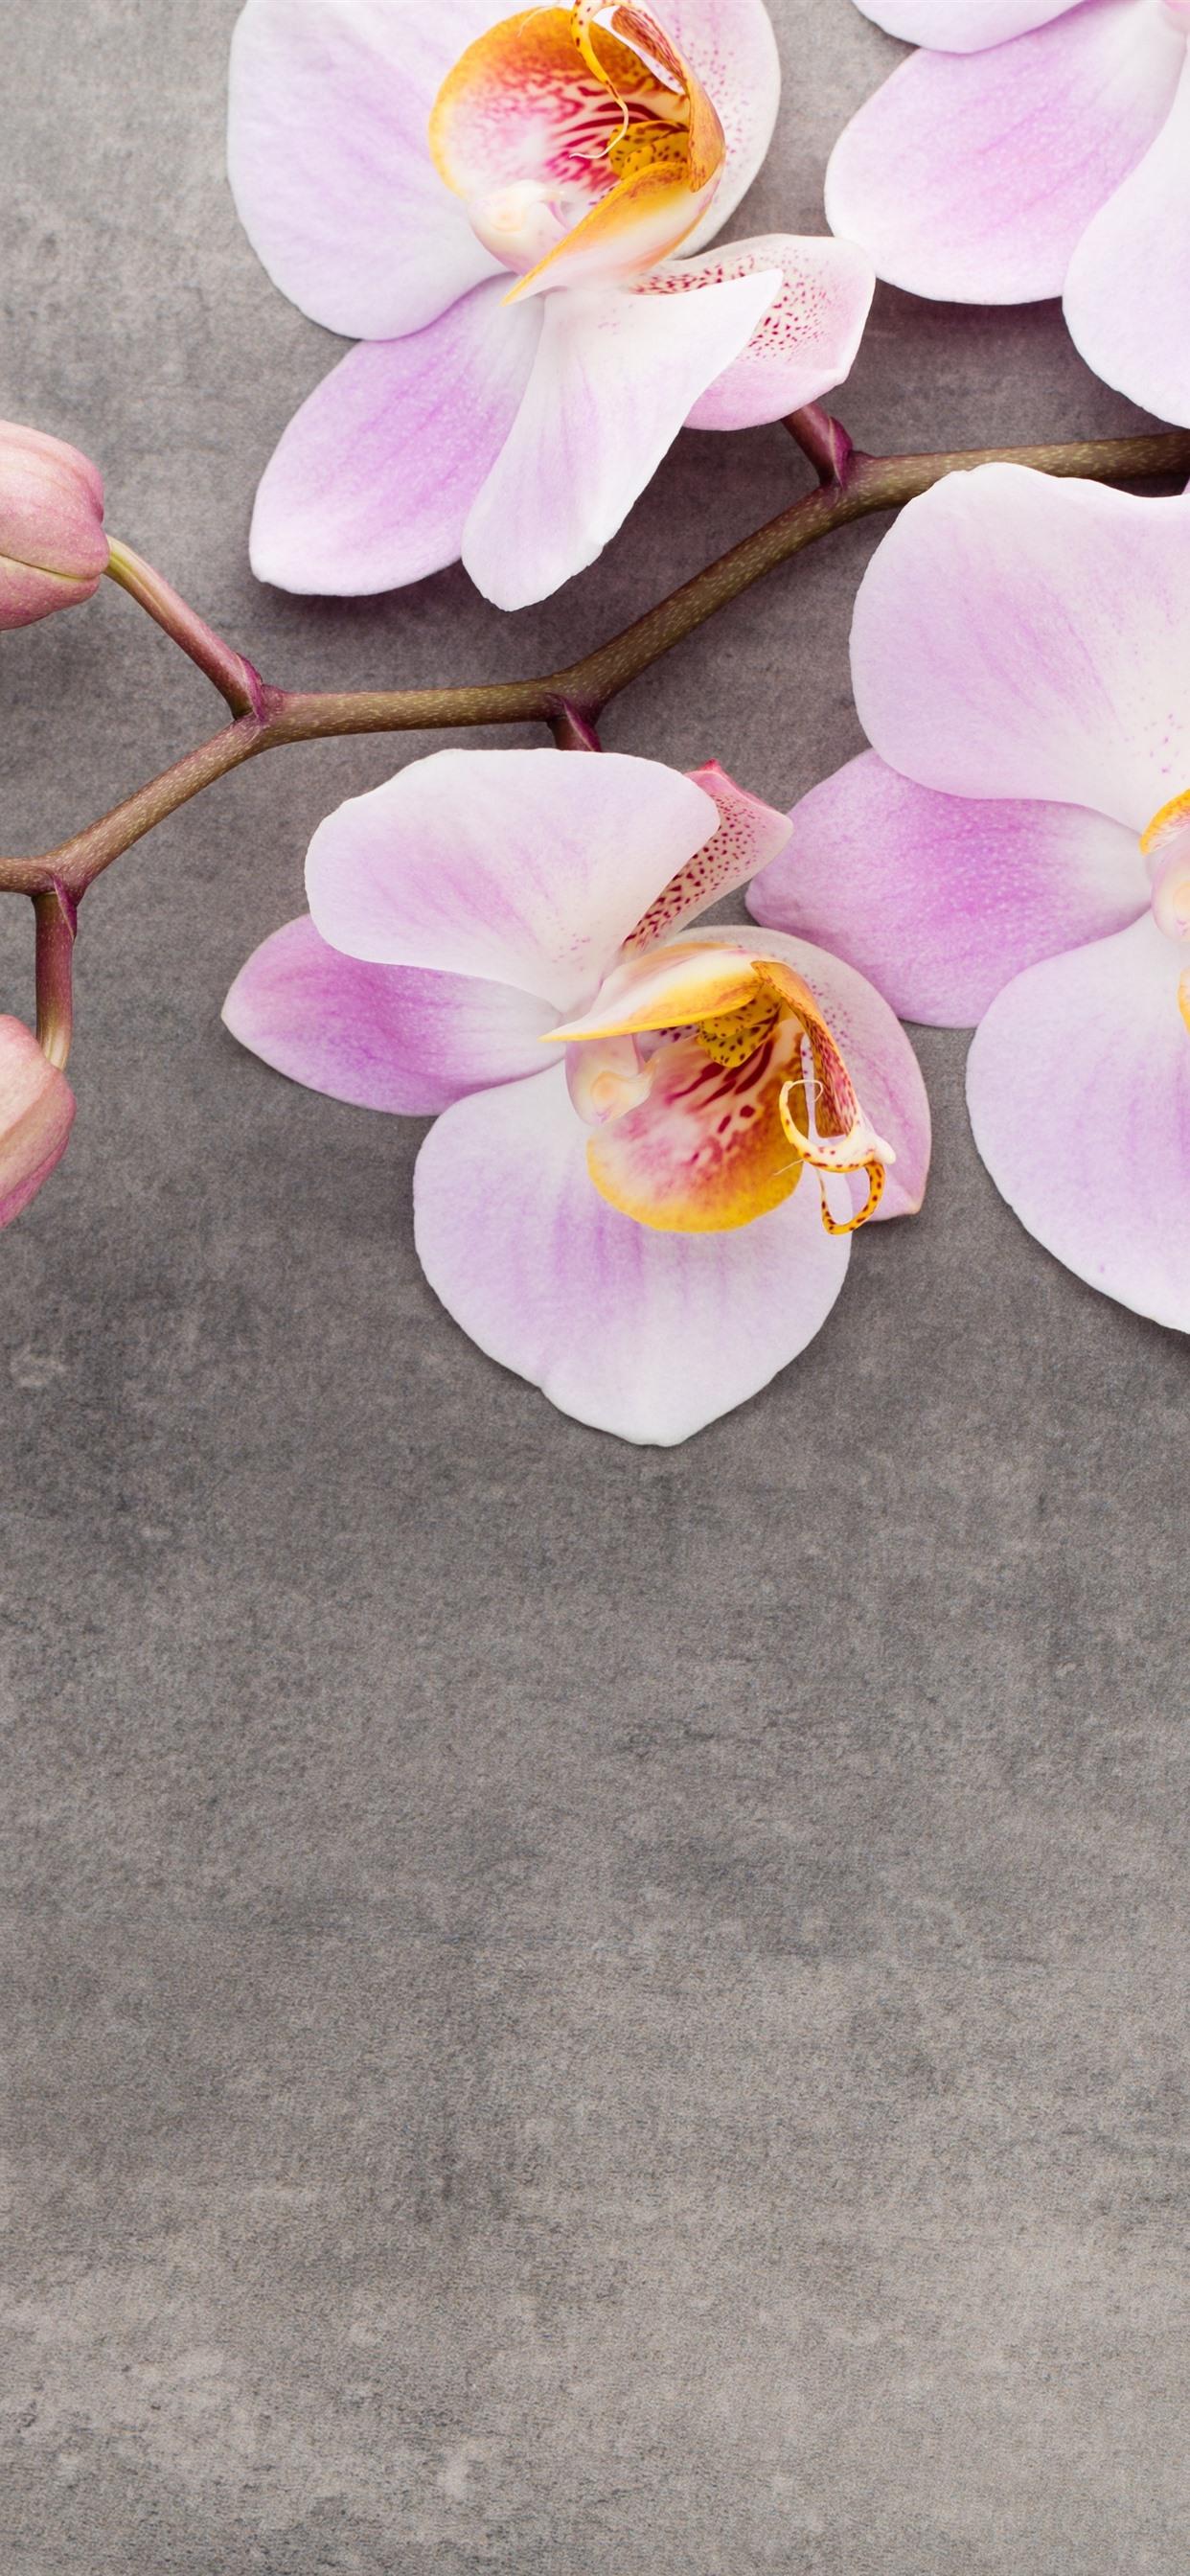 Rosa Phalaenopsis Blumen Nahaufnahme 1242x2688 Iphone Xs